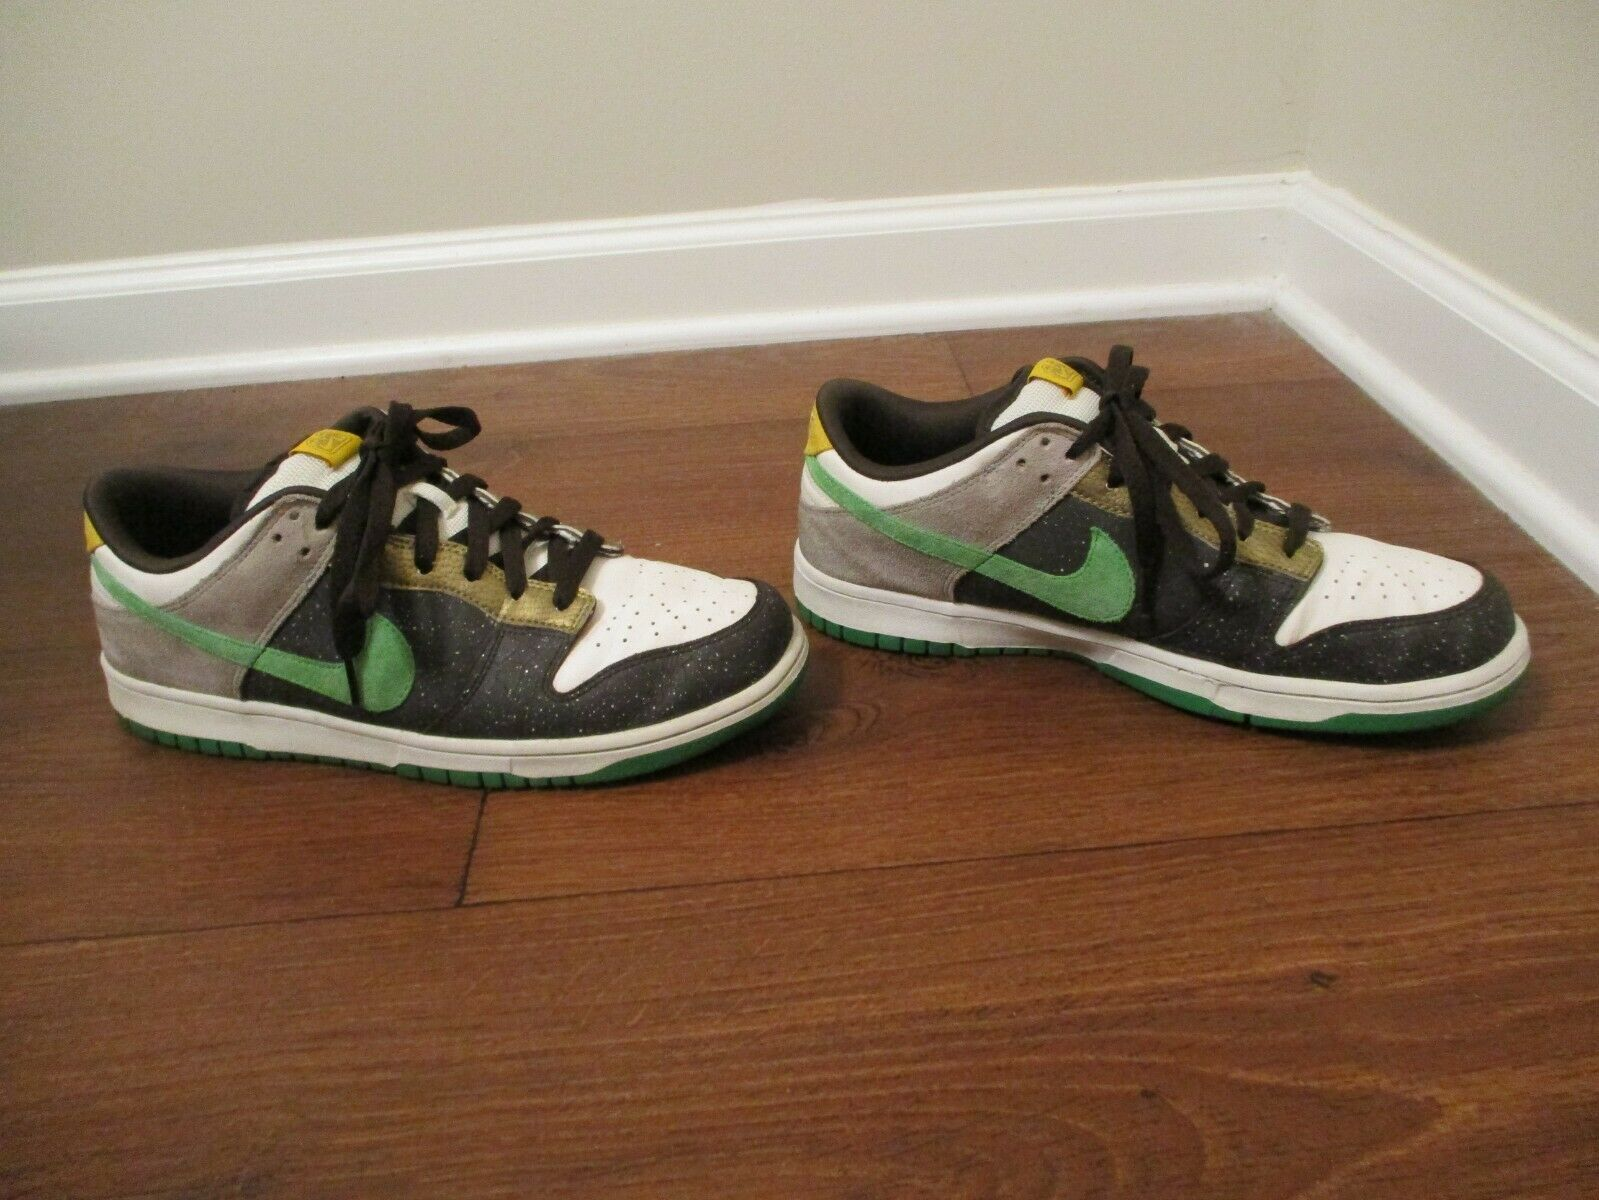 Classico 2008 Usato Worn Sz  10.5 Nike Dunk Low 6.0 Scarpe Cenerentola Oscura, Hyper verde  negozio online